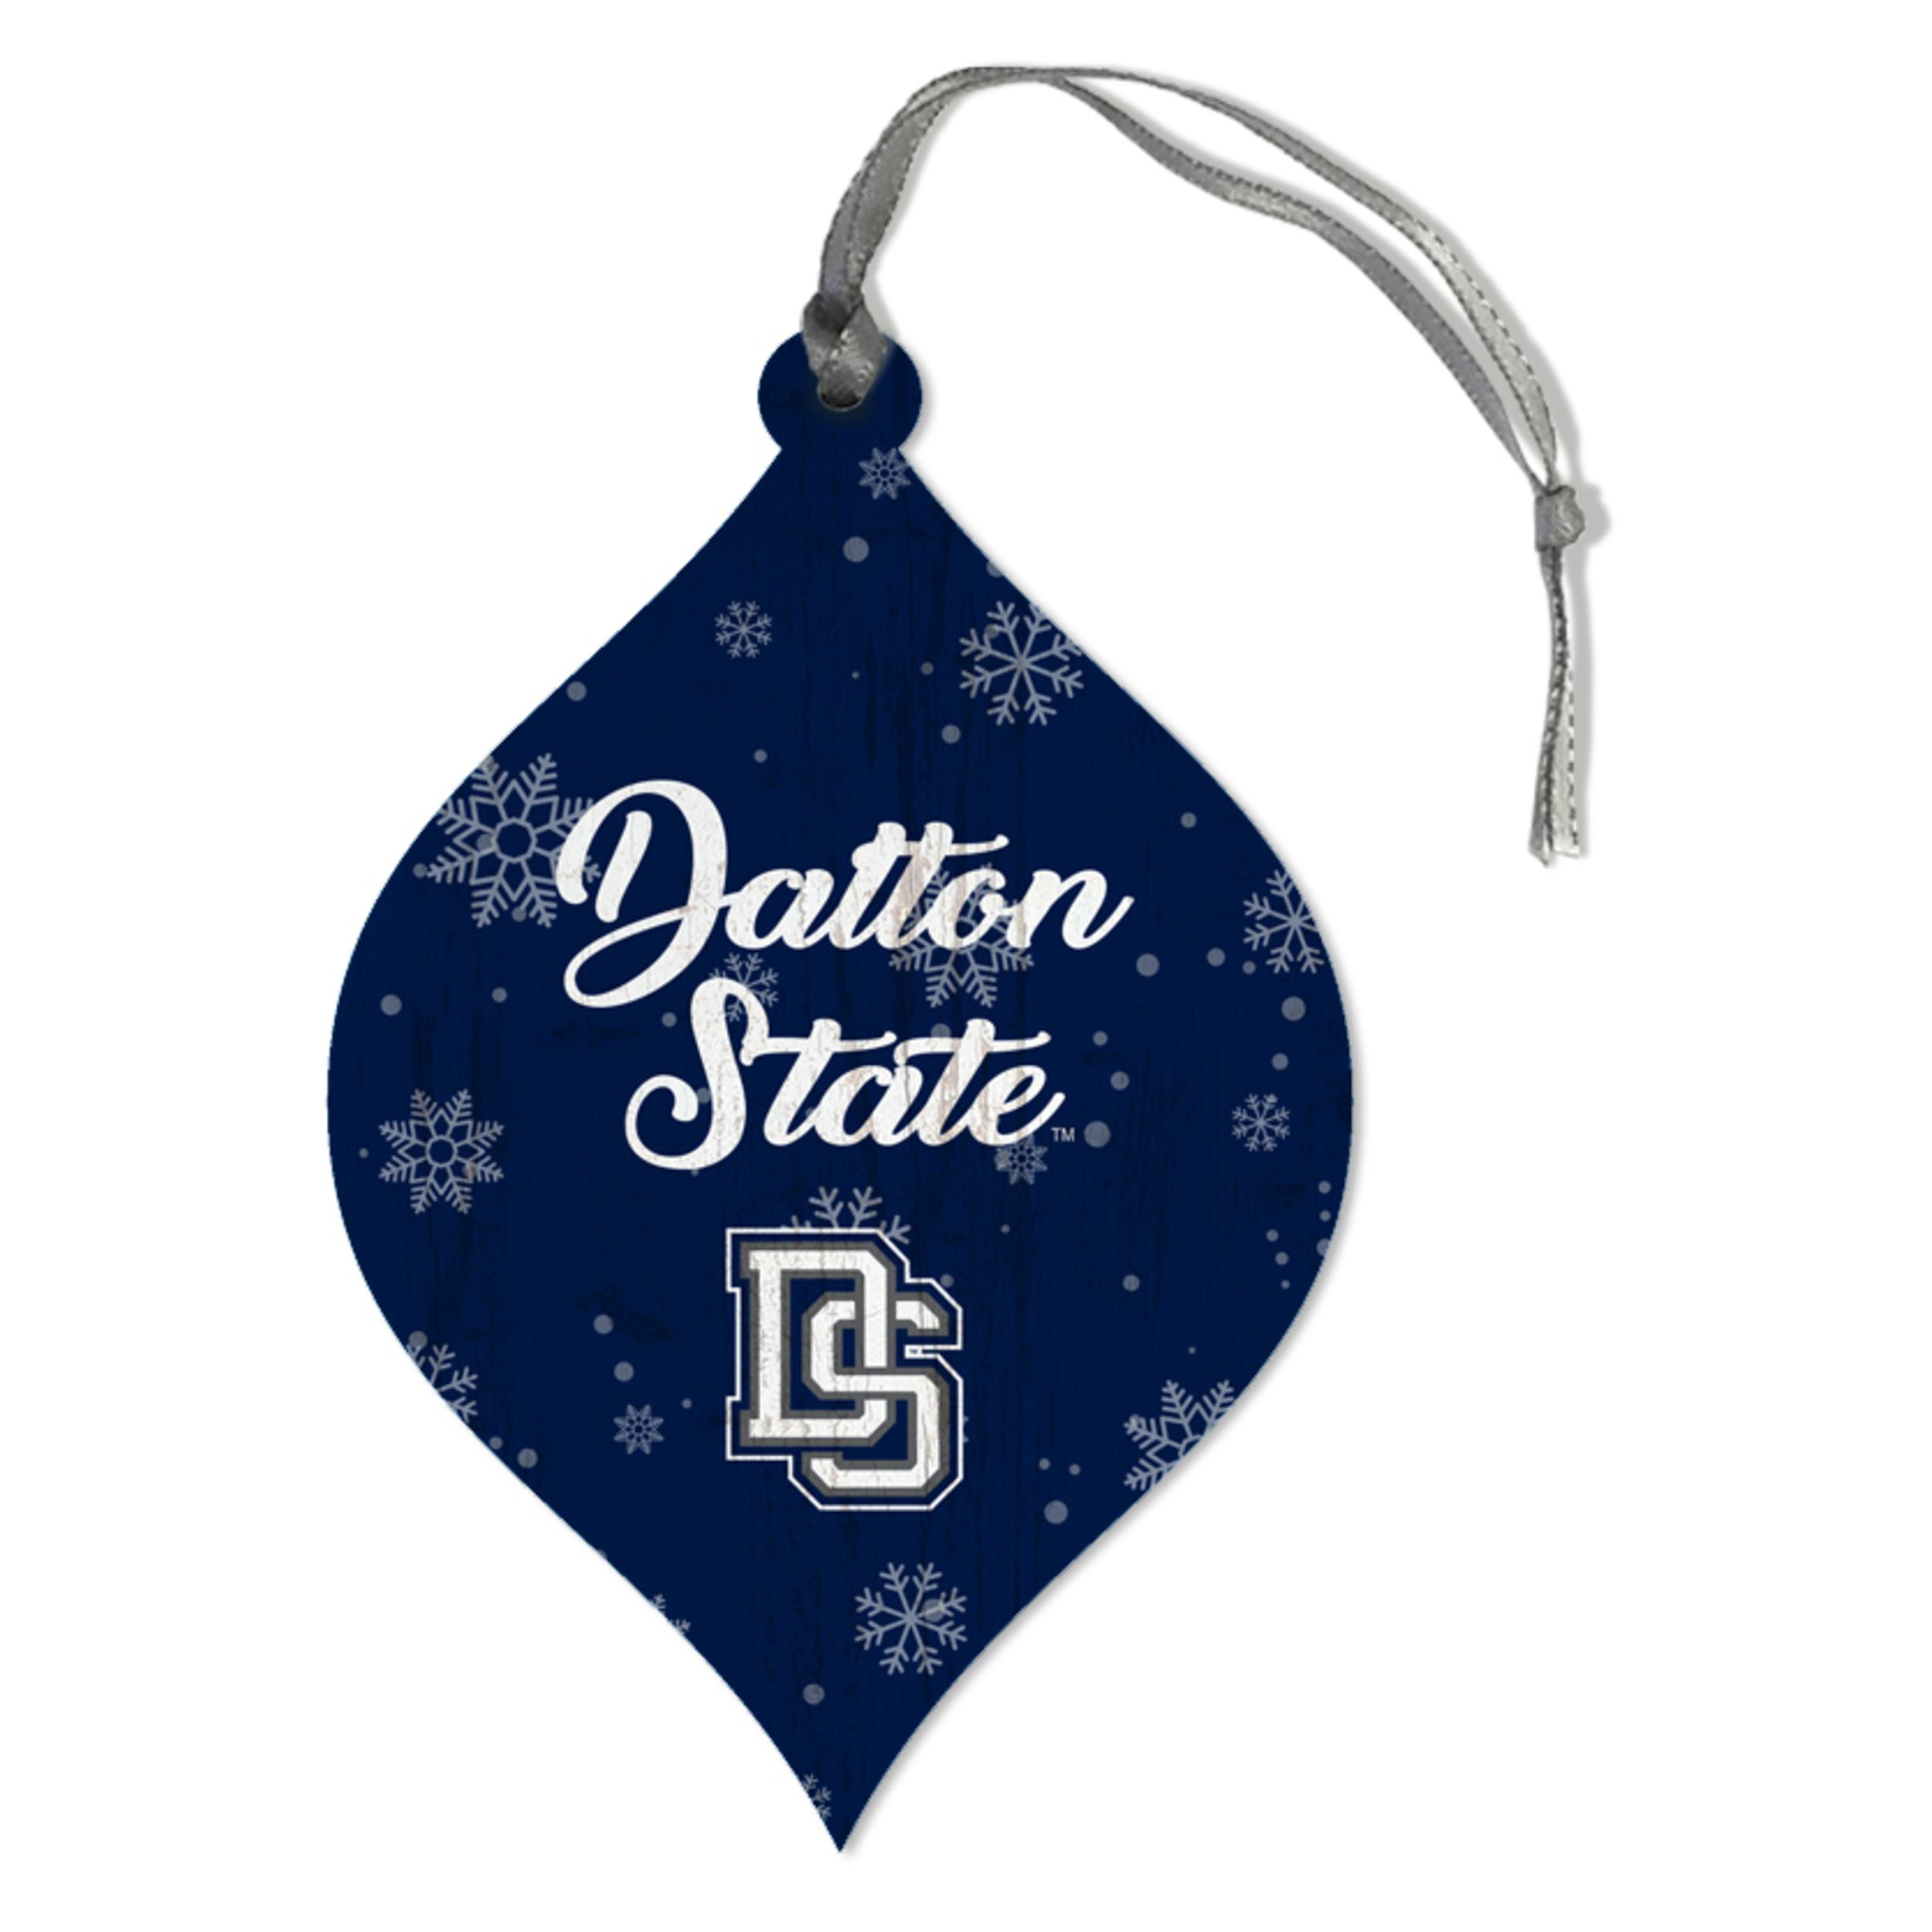 Dalton State Snowflakes Teardrop Ornament